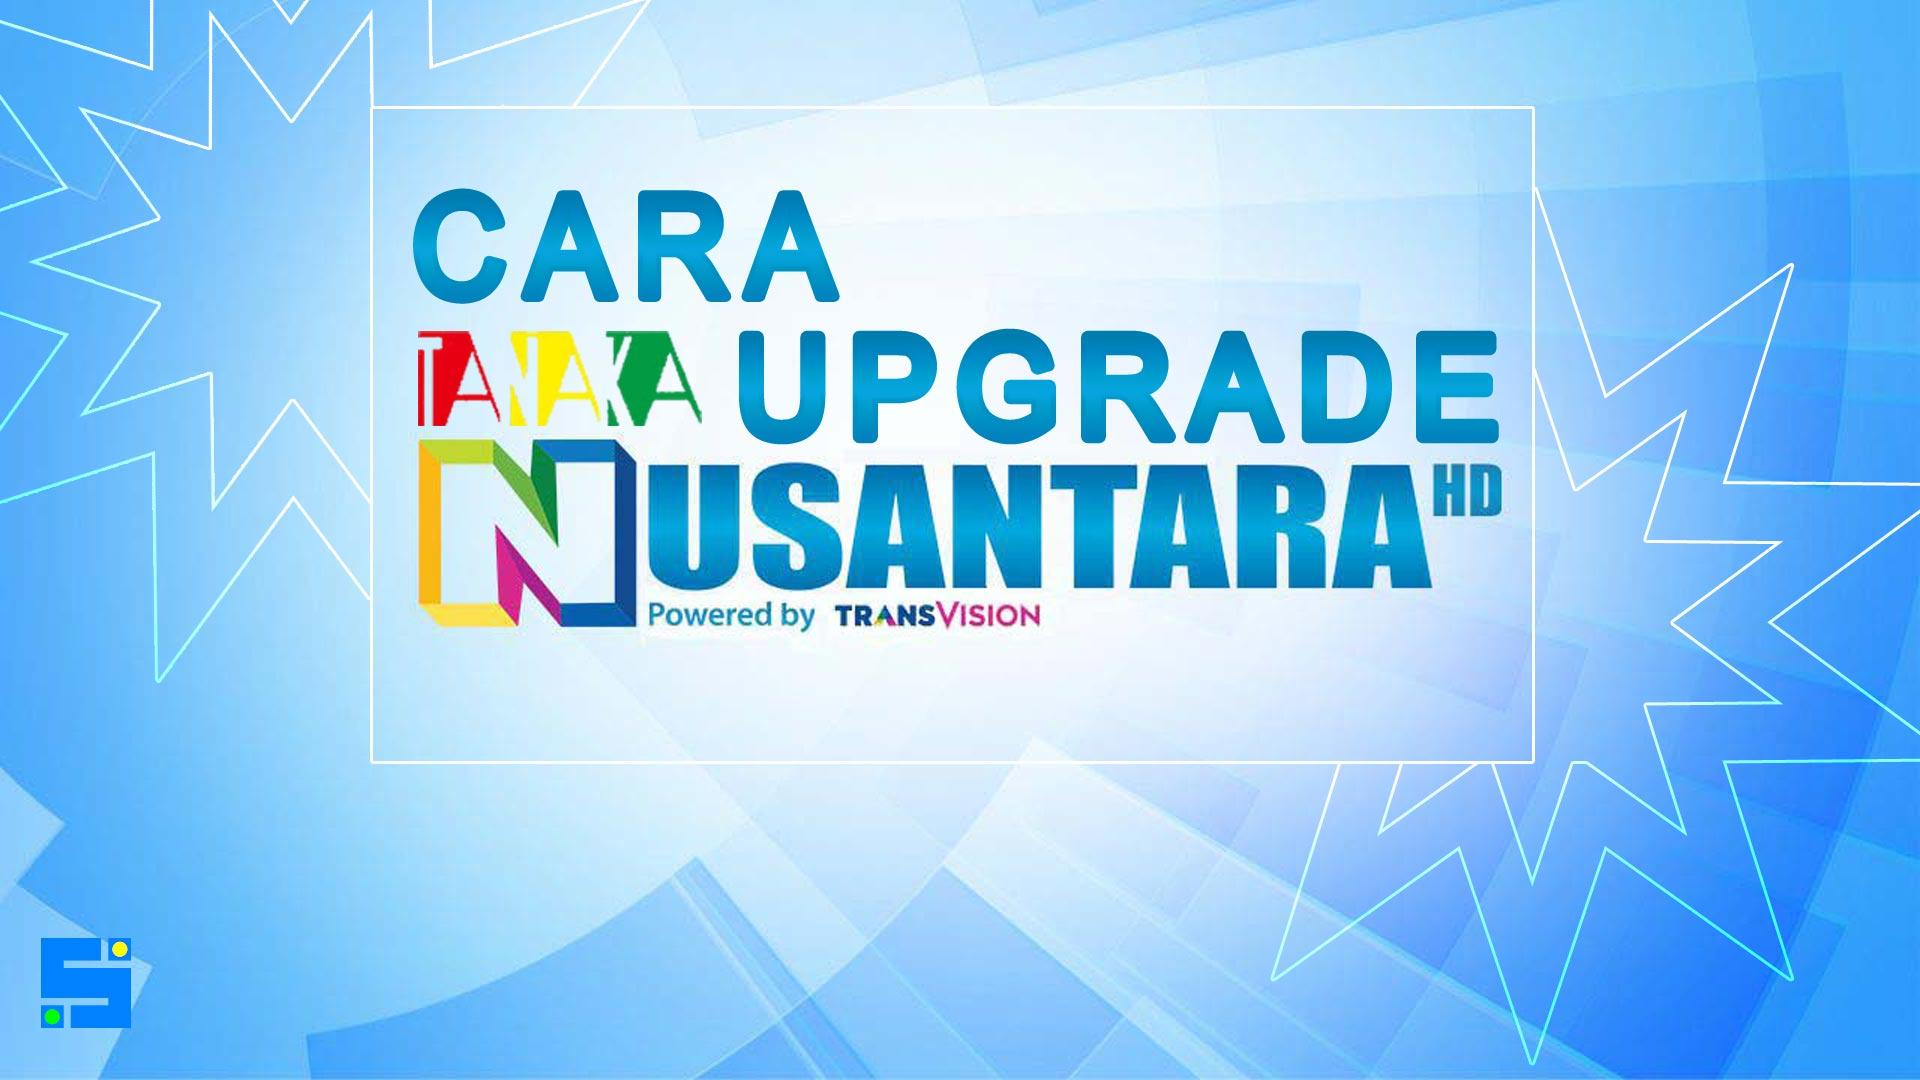 Cara Upgrade SW Tanaka Nusantara HD TransVision